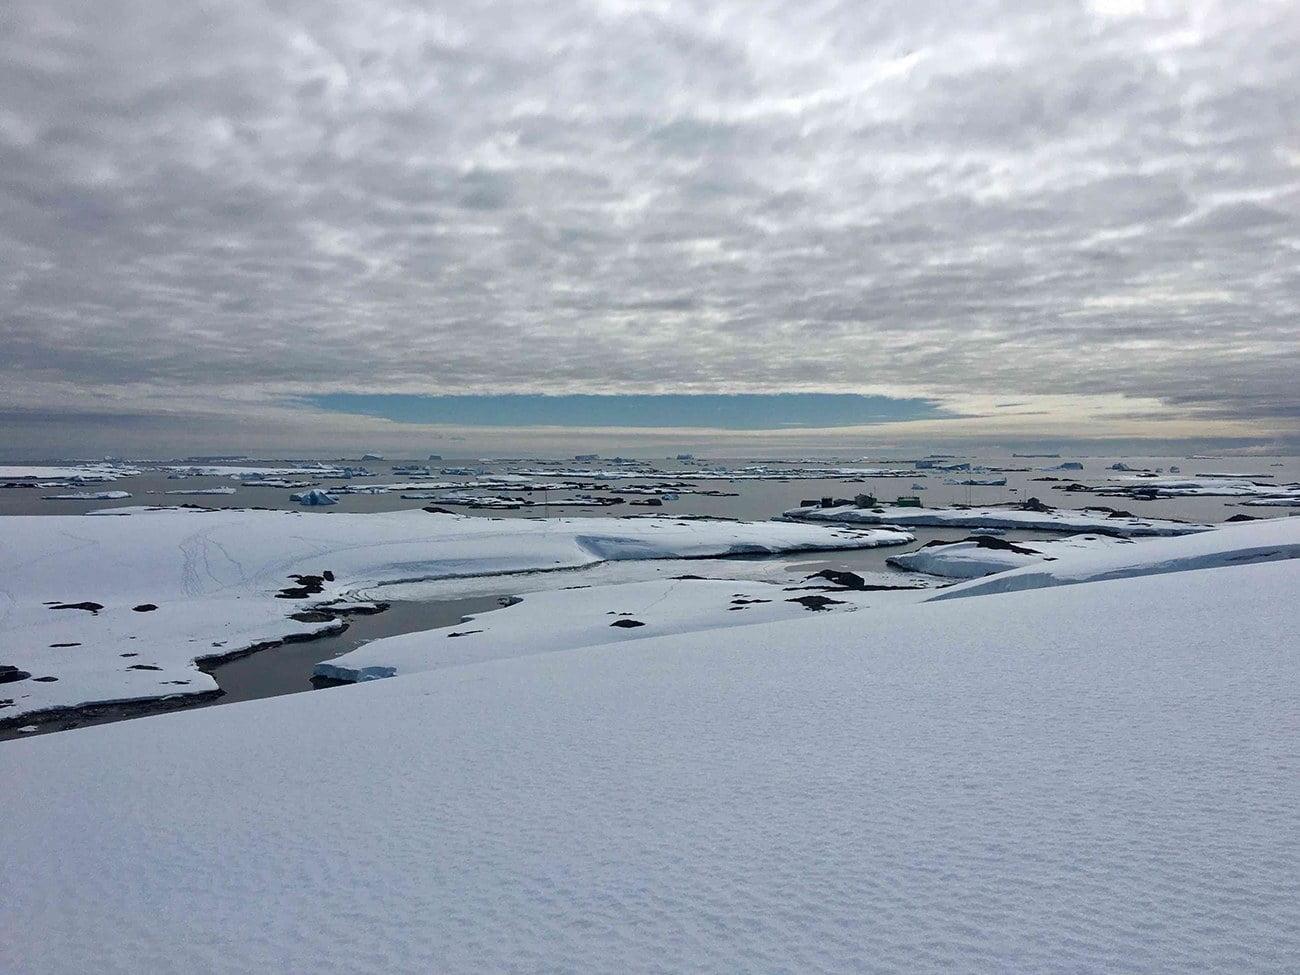 imagem da base ucraniana Vernadsky, na Antártica